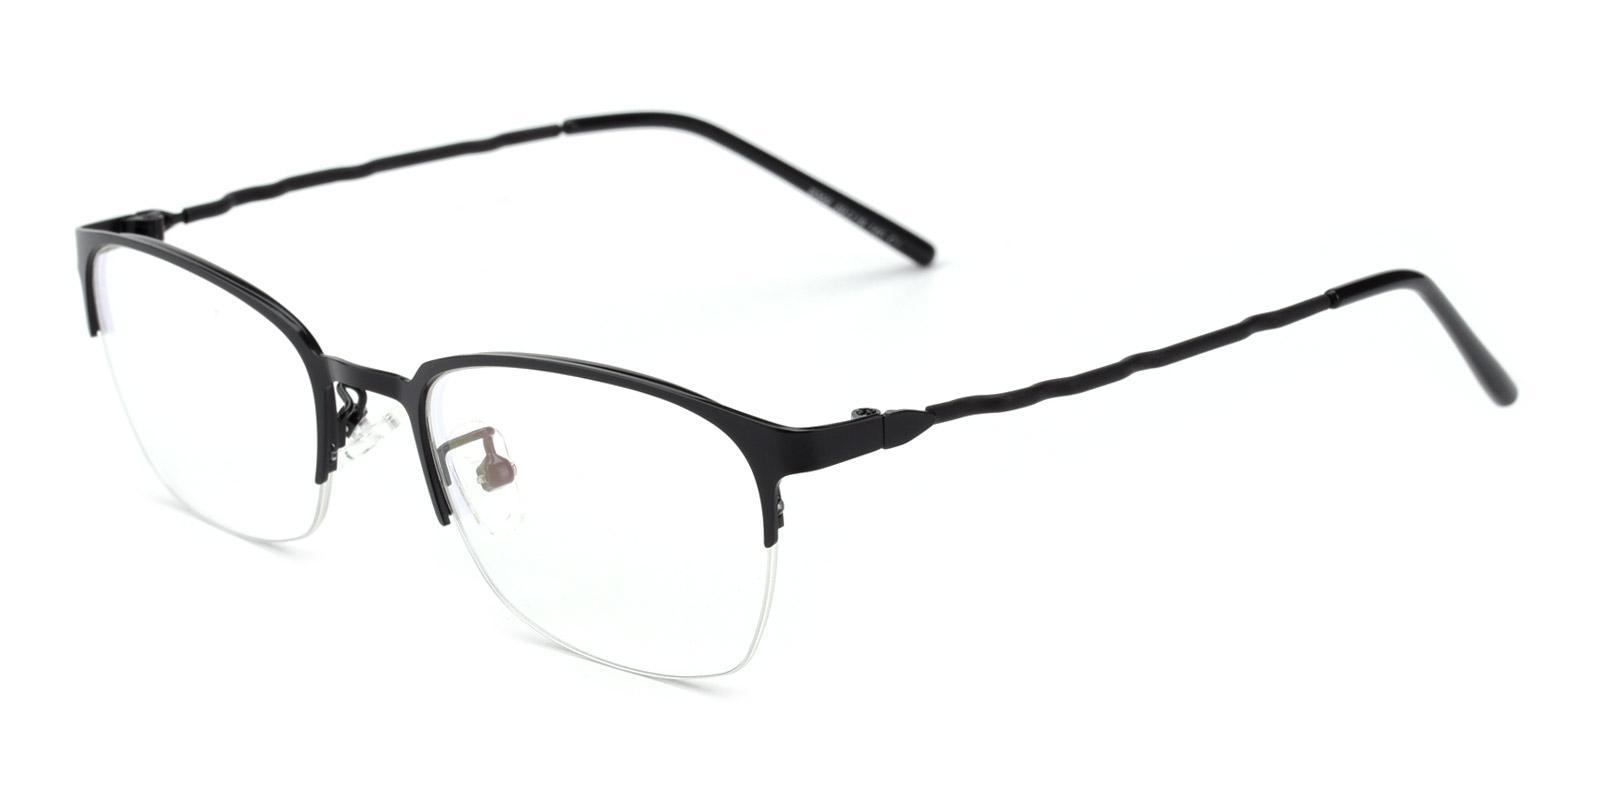 Wavain-Black-Rectangle-Metal-Eyeglasses-detail